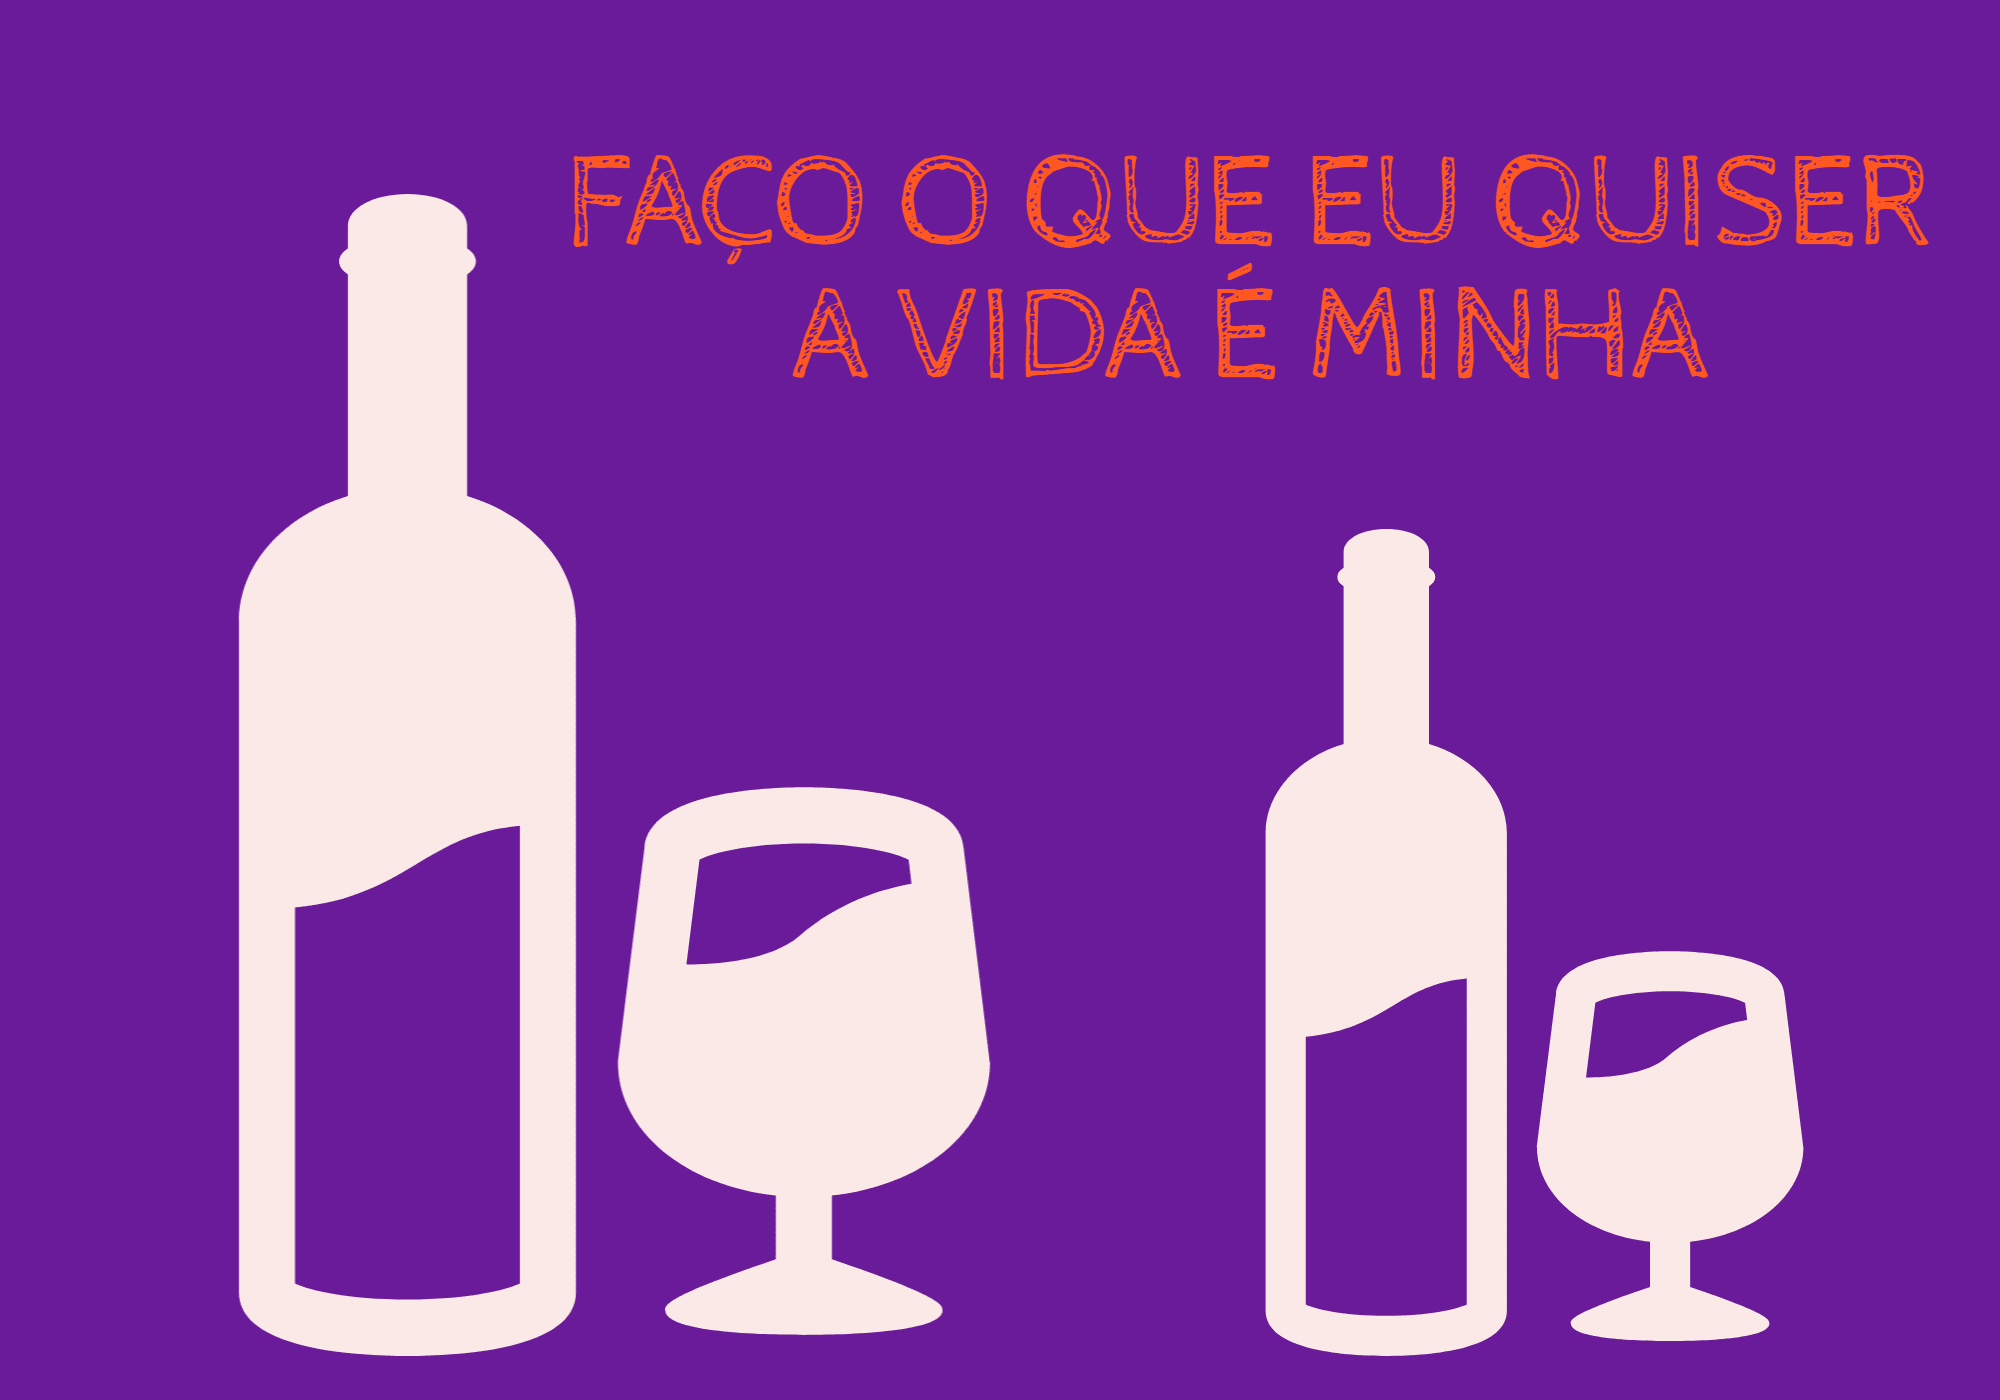 Bottle,                Purple,                Text,                Glass,                Violet,                White,                Blue,                 Free Image